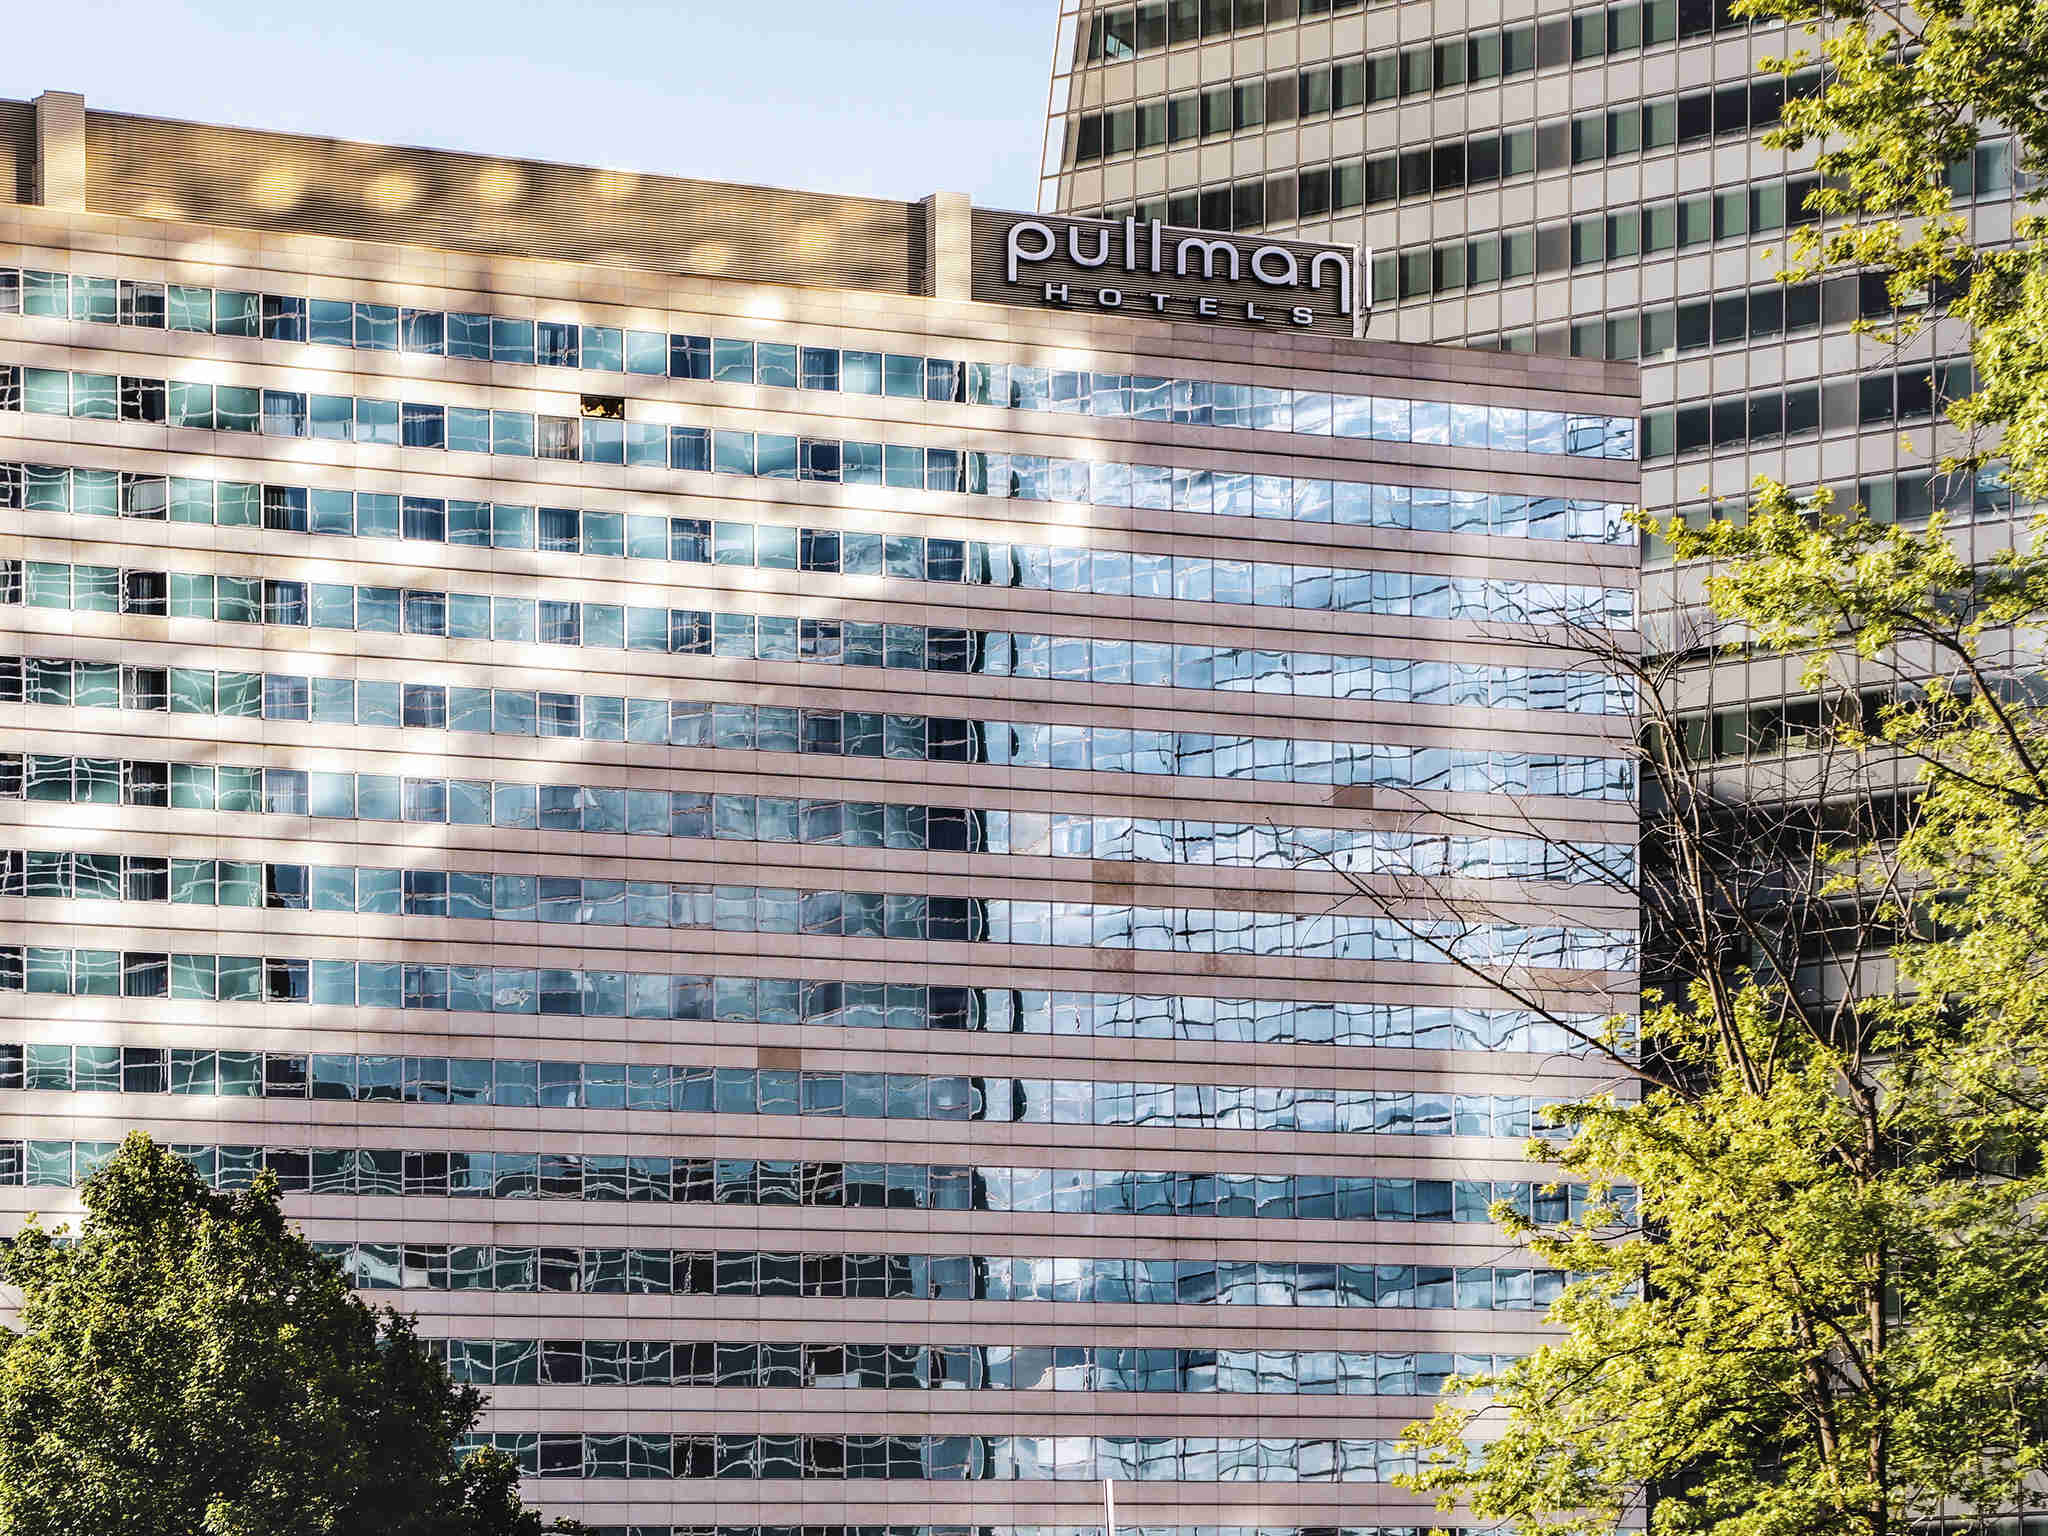 Hotel in Courbevoie Pullman Paris La Défense